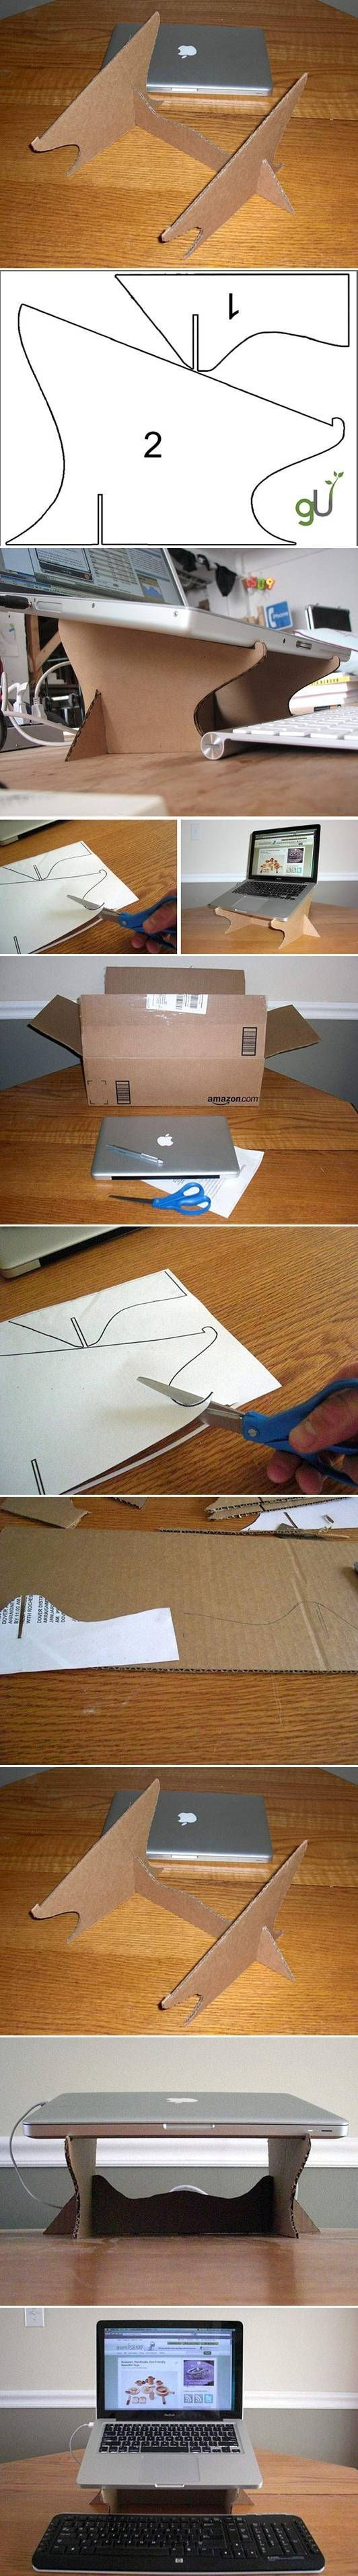 DIY Simple Cardboard Laptop Stand DIY Projects | UsefulDIY.com Follow us on Facebook ==> https://www.facebook.com/UsefulDiy